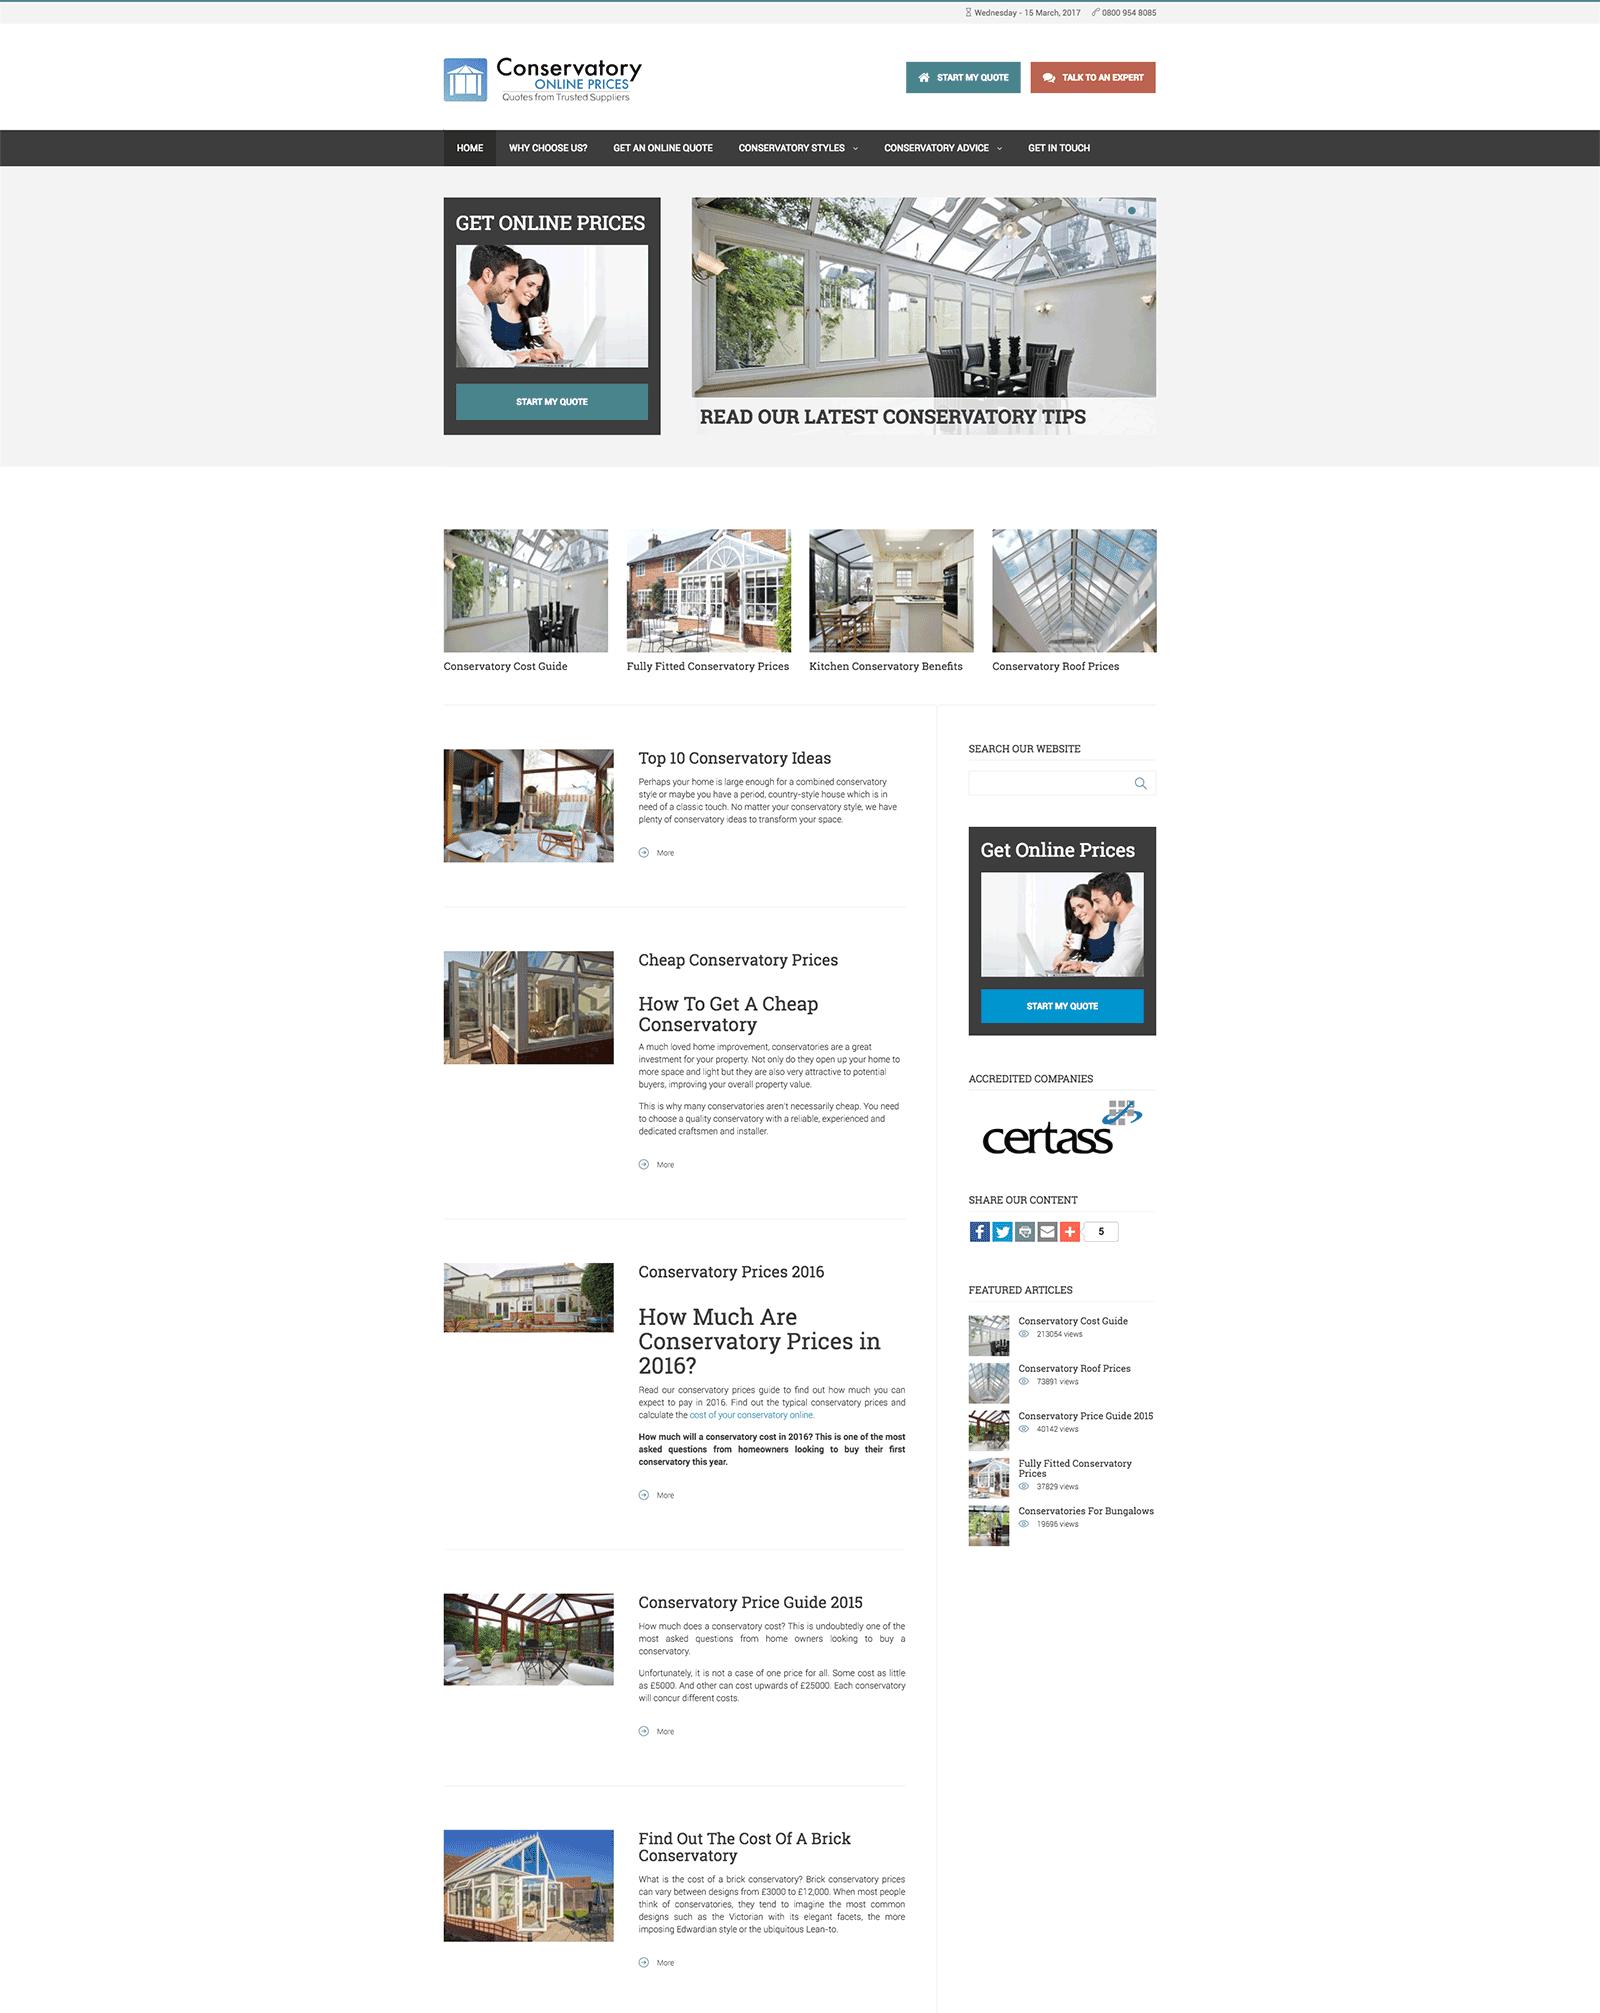 conservatory online prices website